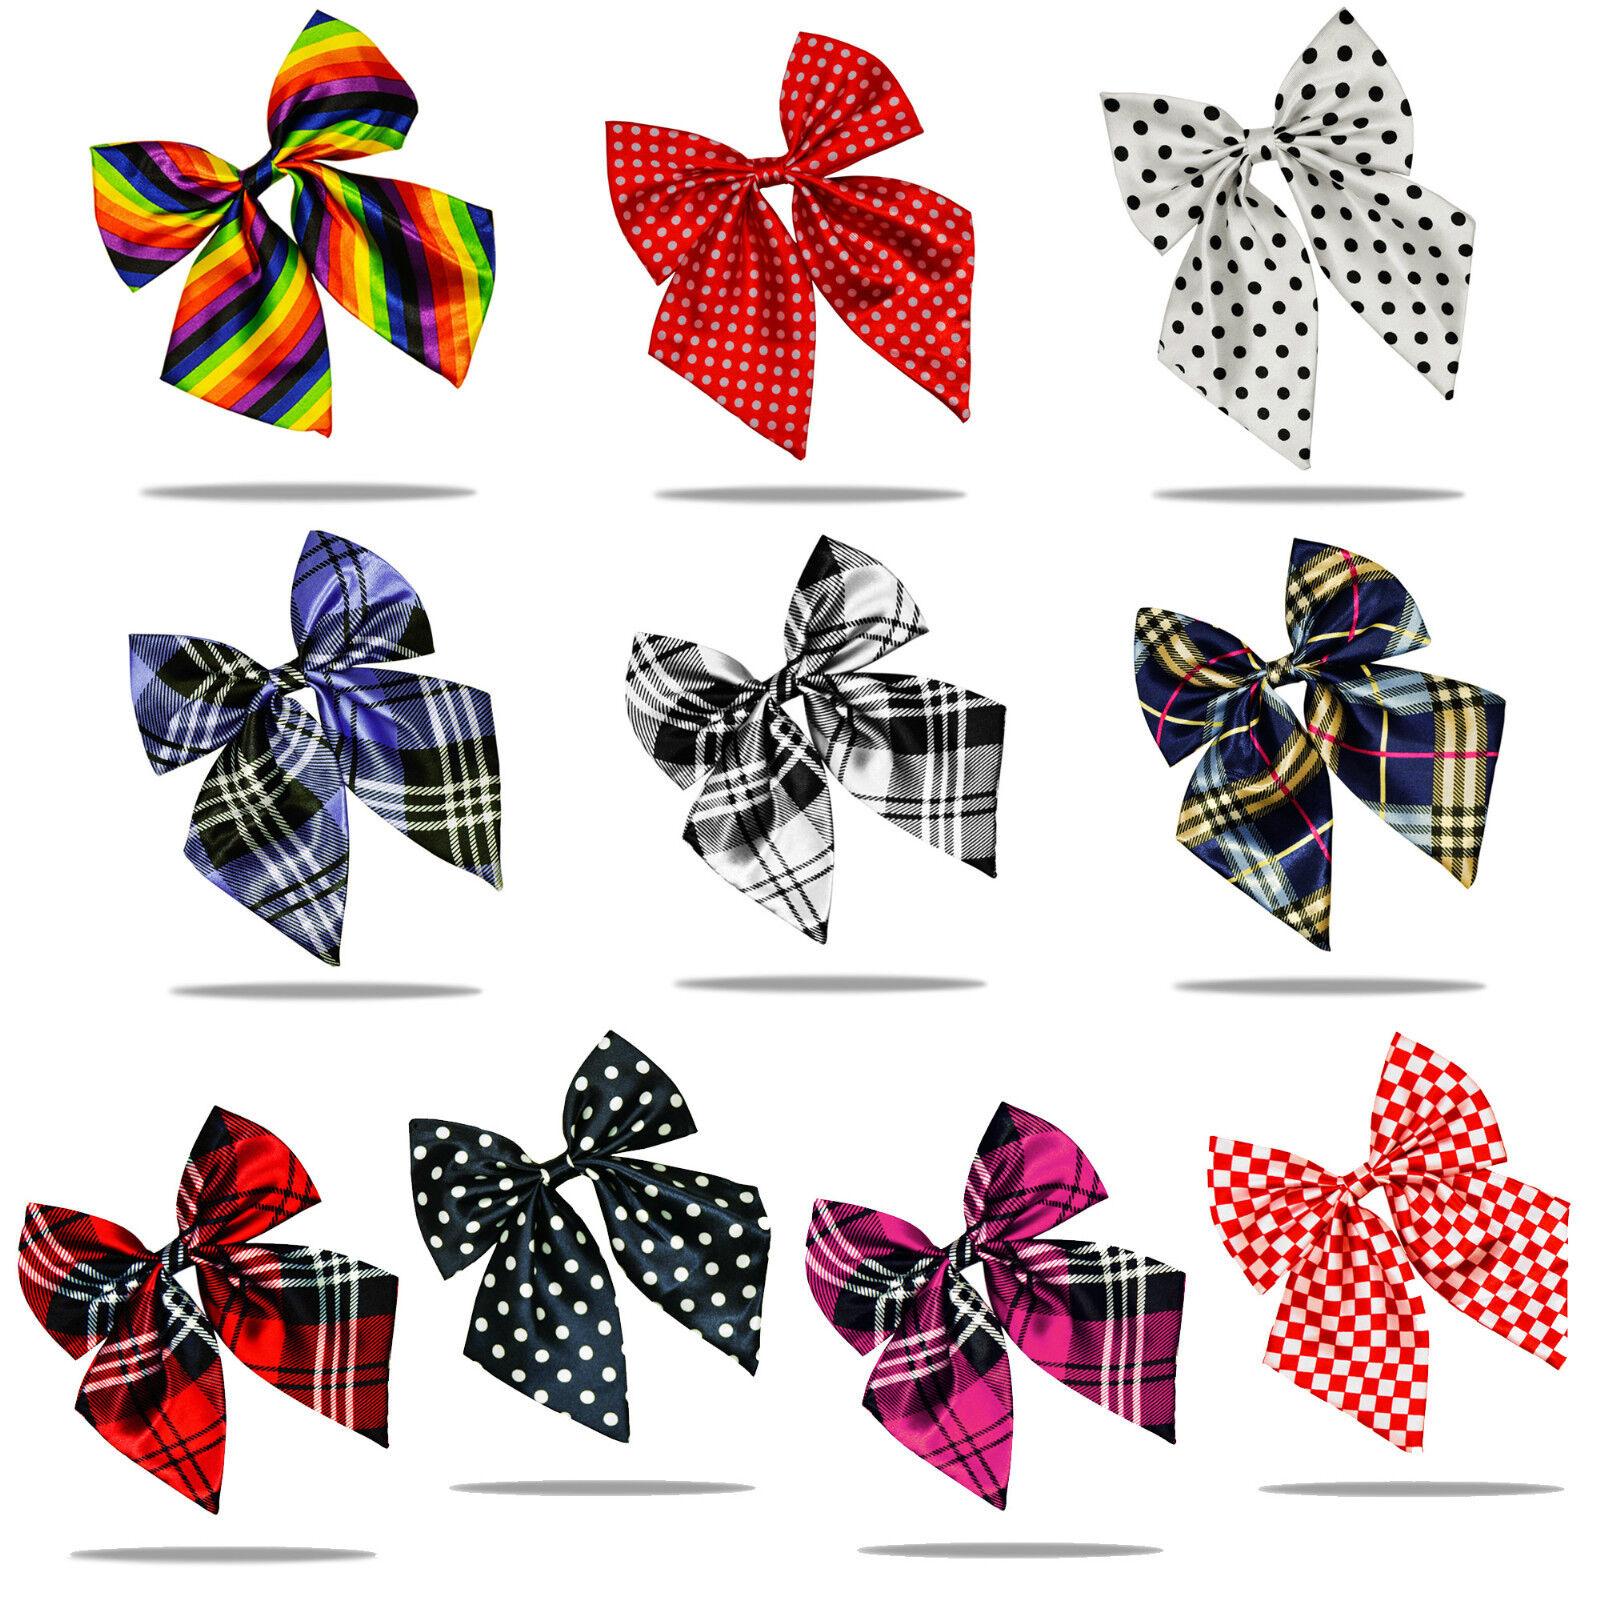 Fashionable Women Ladies Girls Satin Novelty Bow Tie Tartan Polka Dots Pre Tied